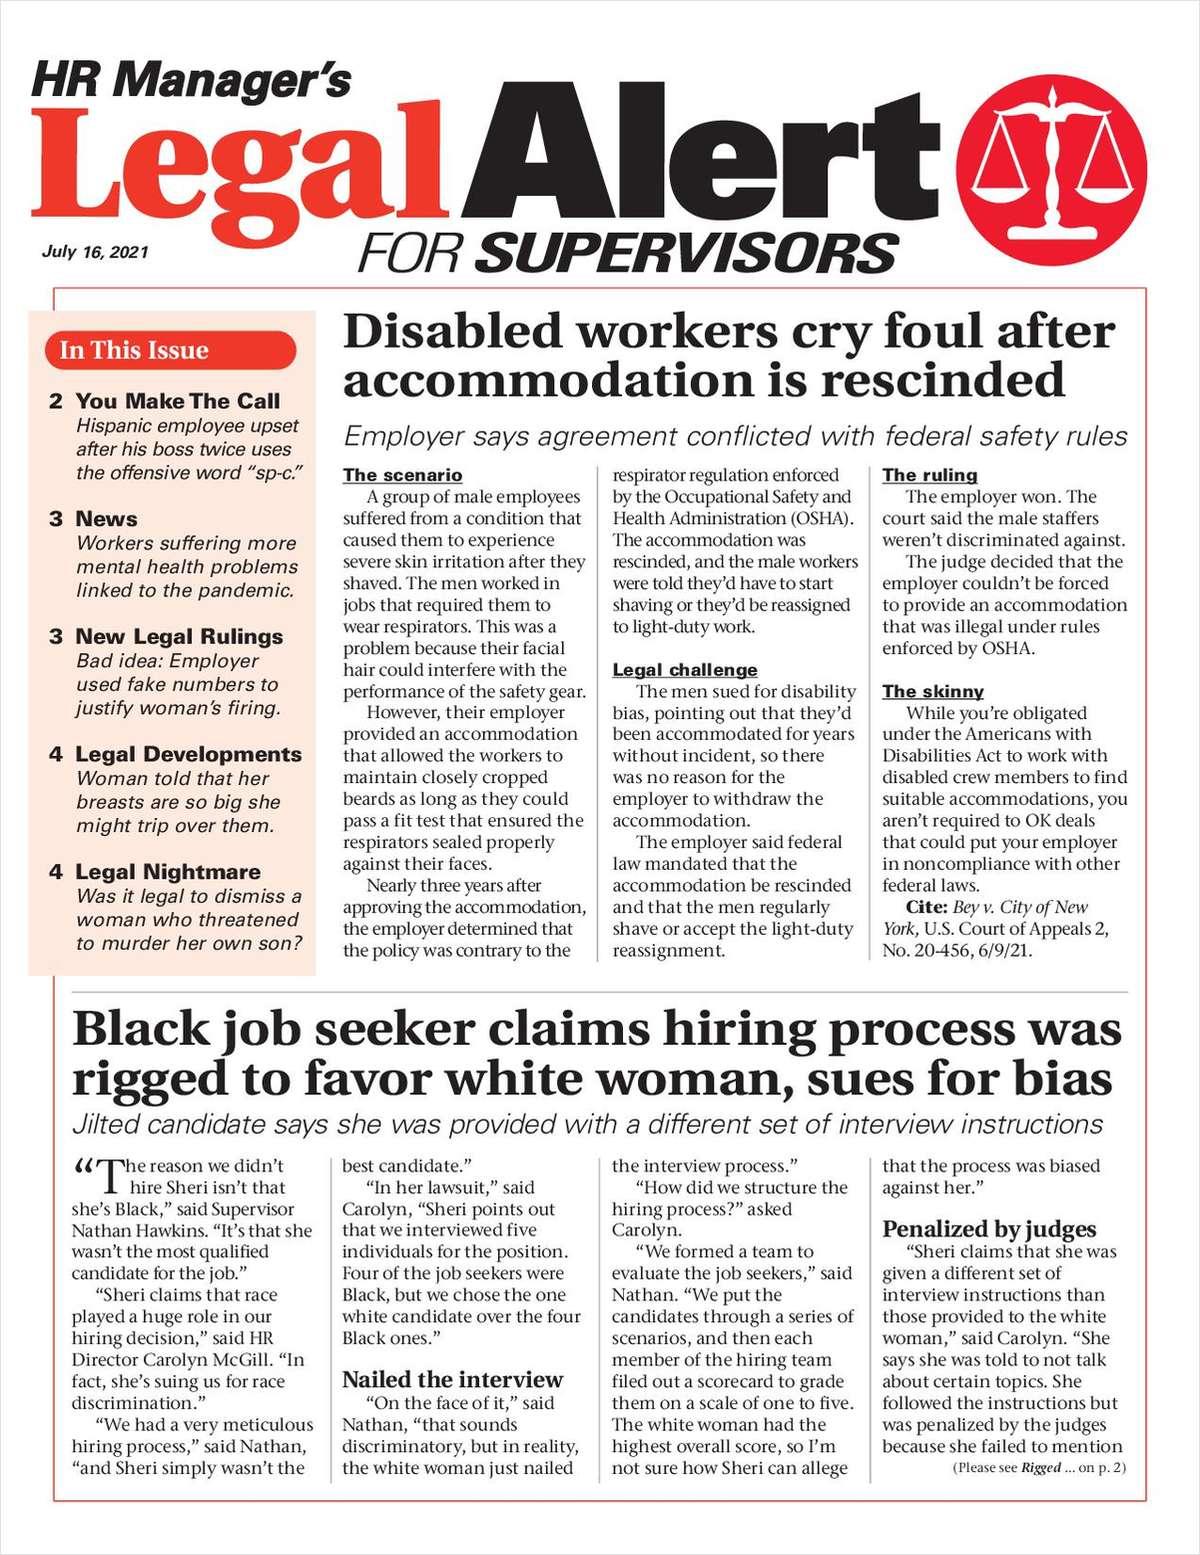 HR Manager's Legal Alert for Supervisors Newsletter: July 16 Edition